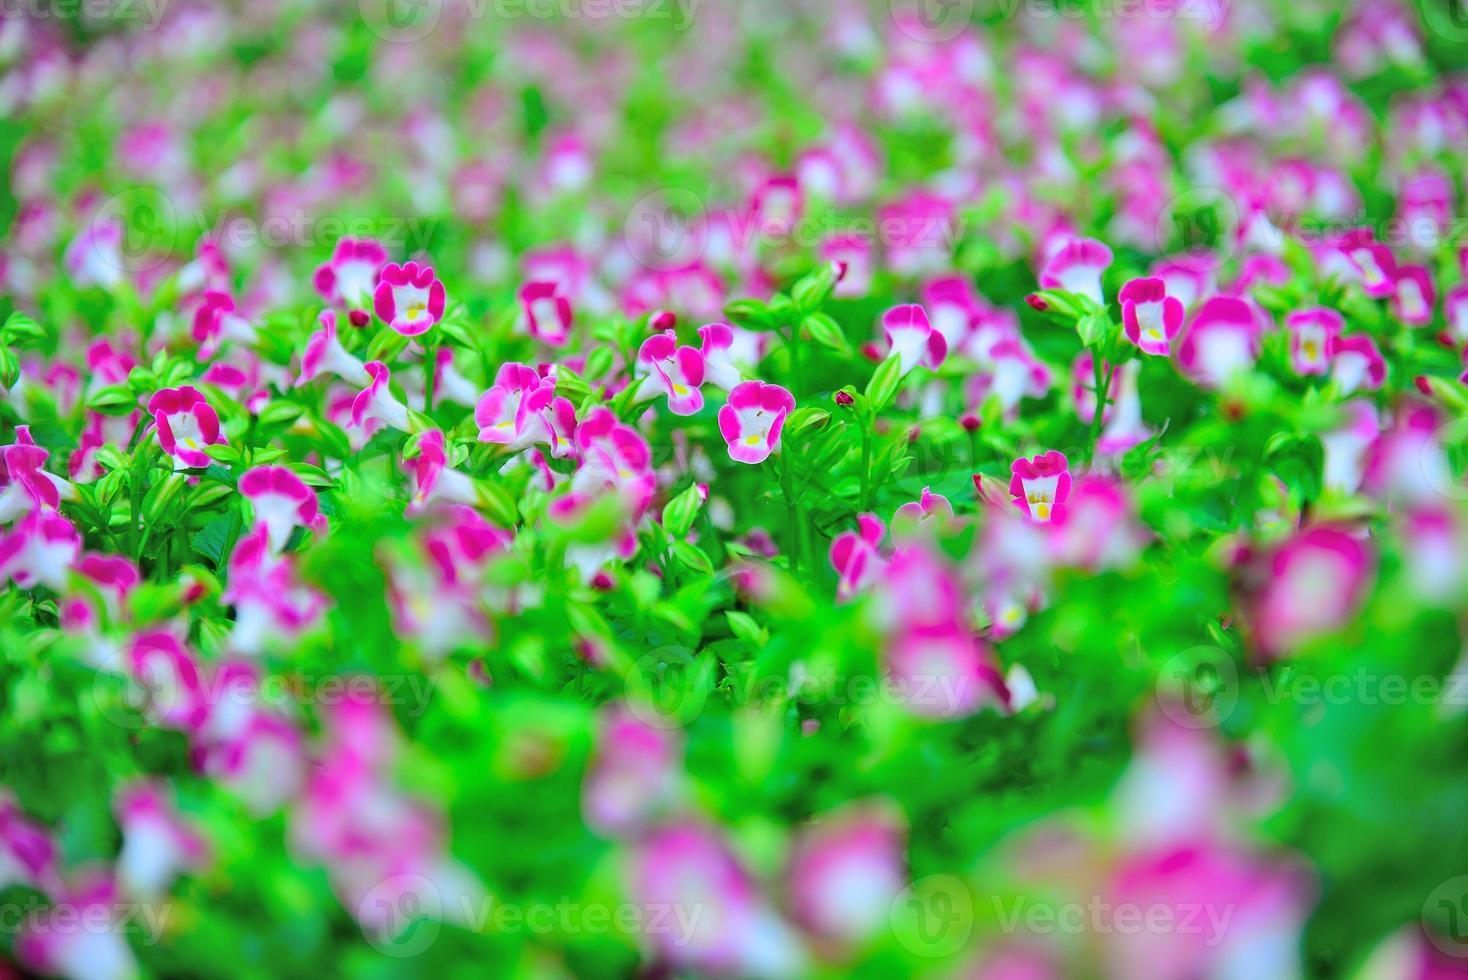 påfågel blomma trädgård lila glitter foto